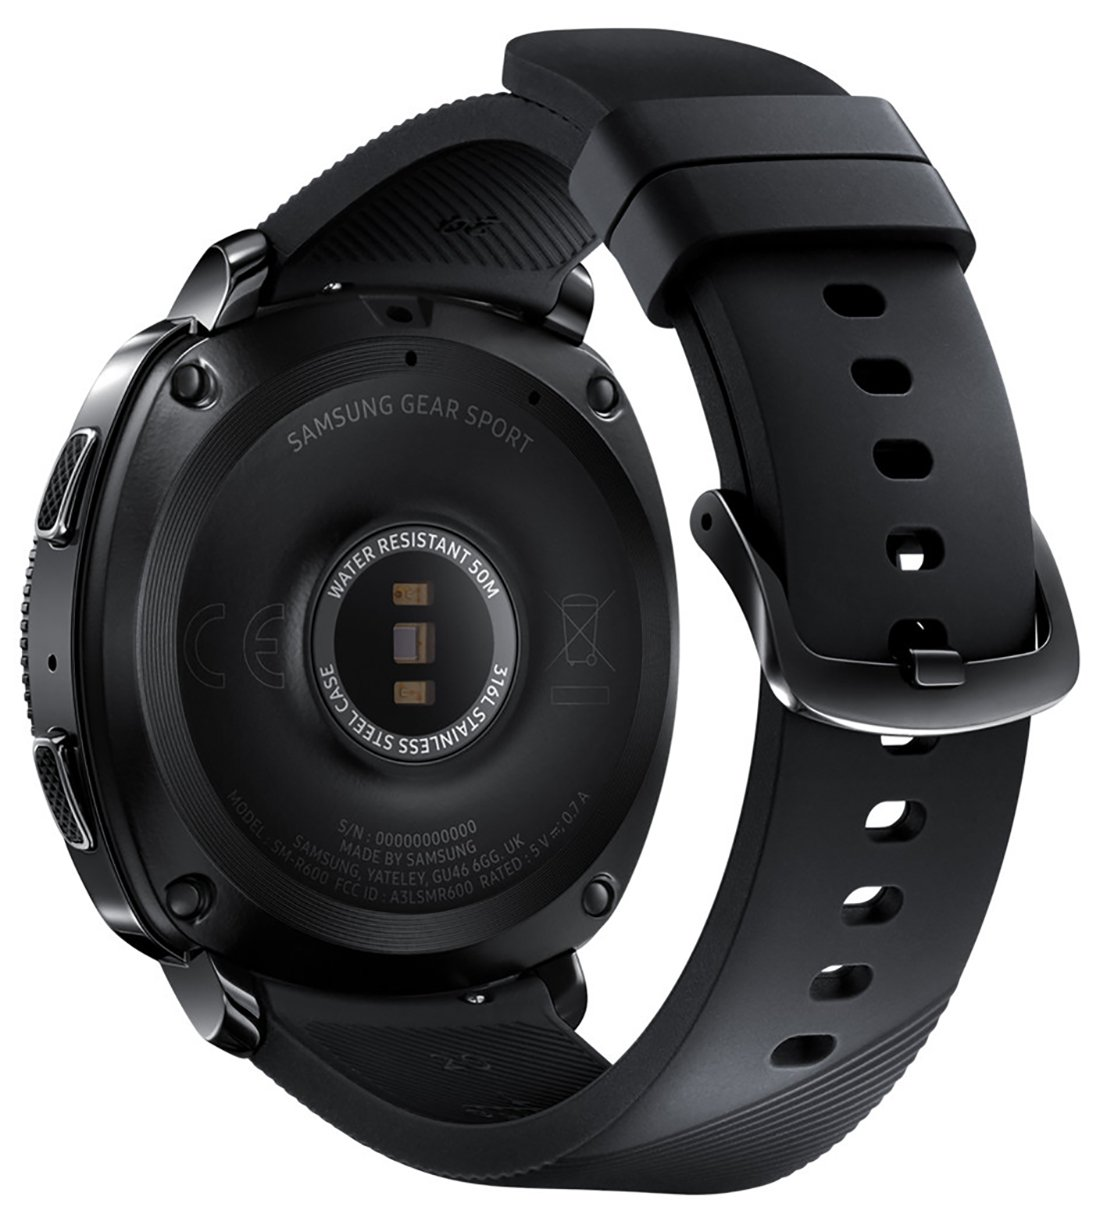 Samsung Gear Sport Smartwatch Fitness Tracker- Water Resistant - International Version- No Warranty- Black (SM-R600NZKATTT) by Samsung (Image #4)